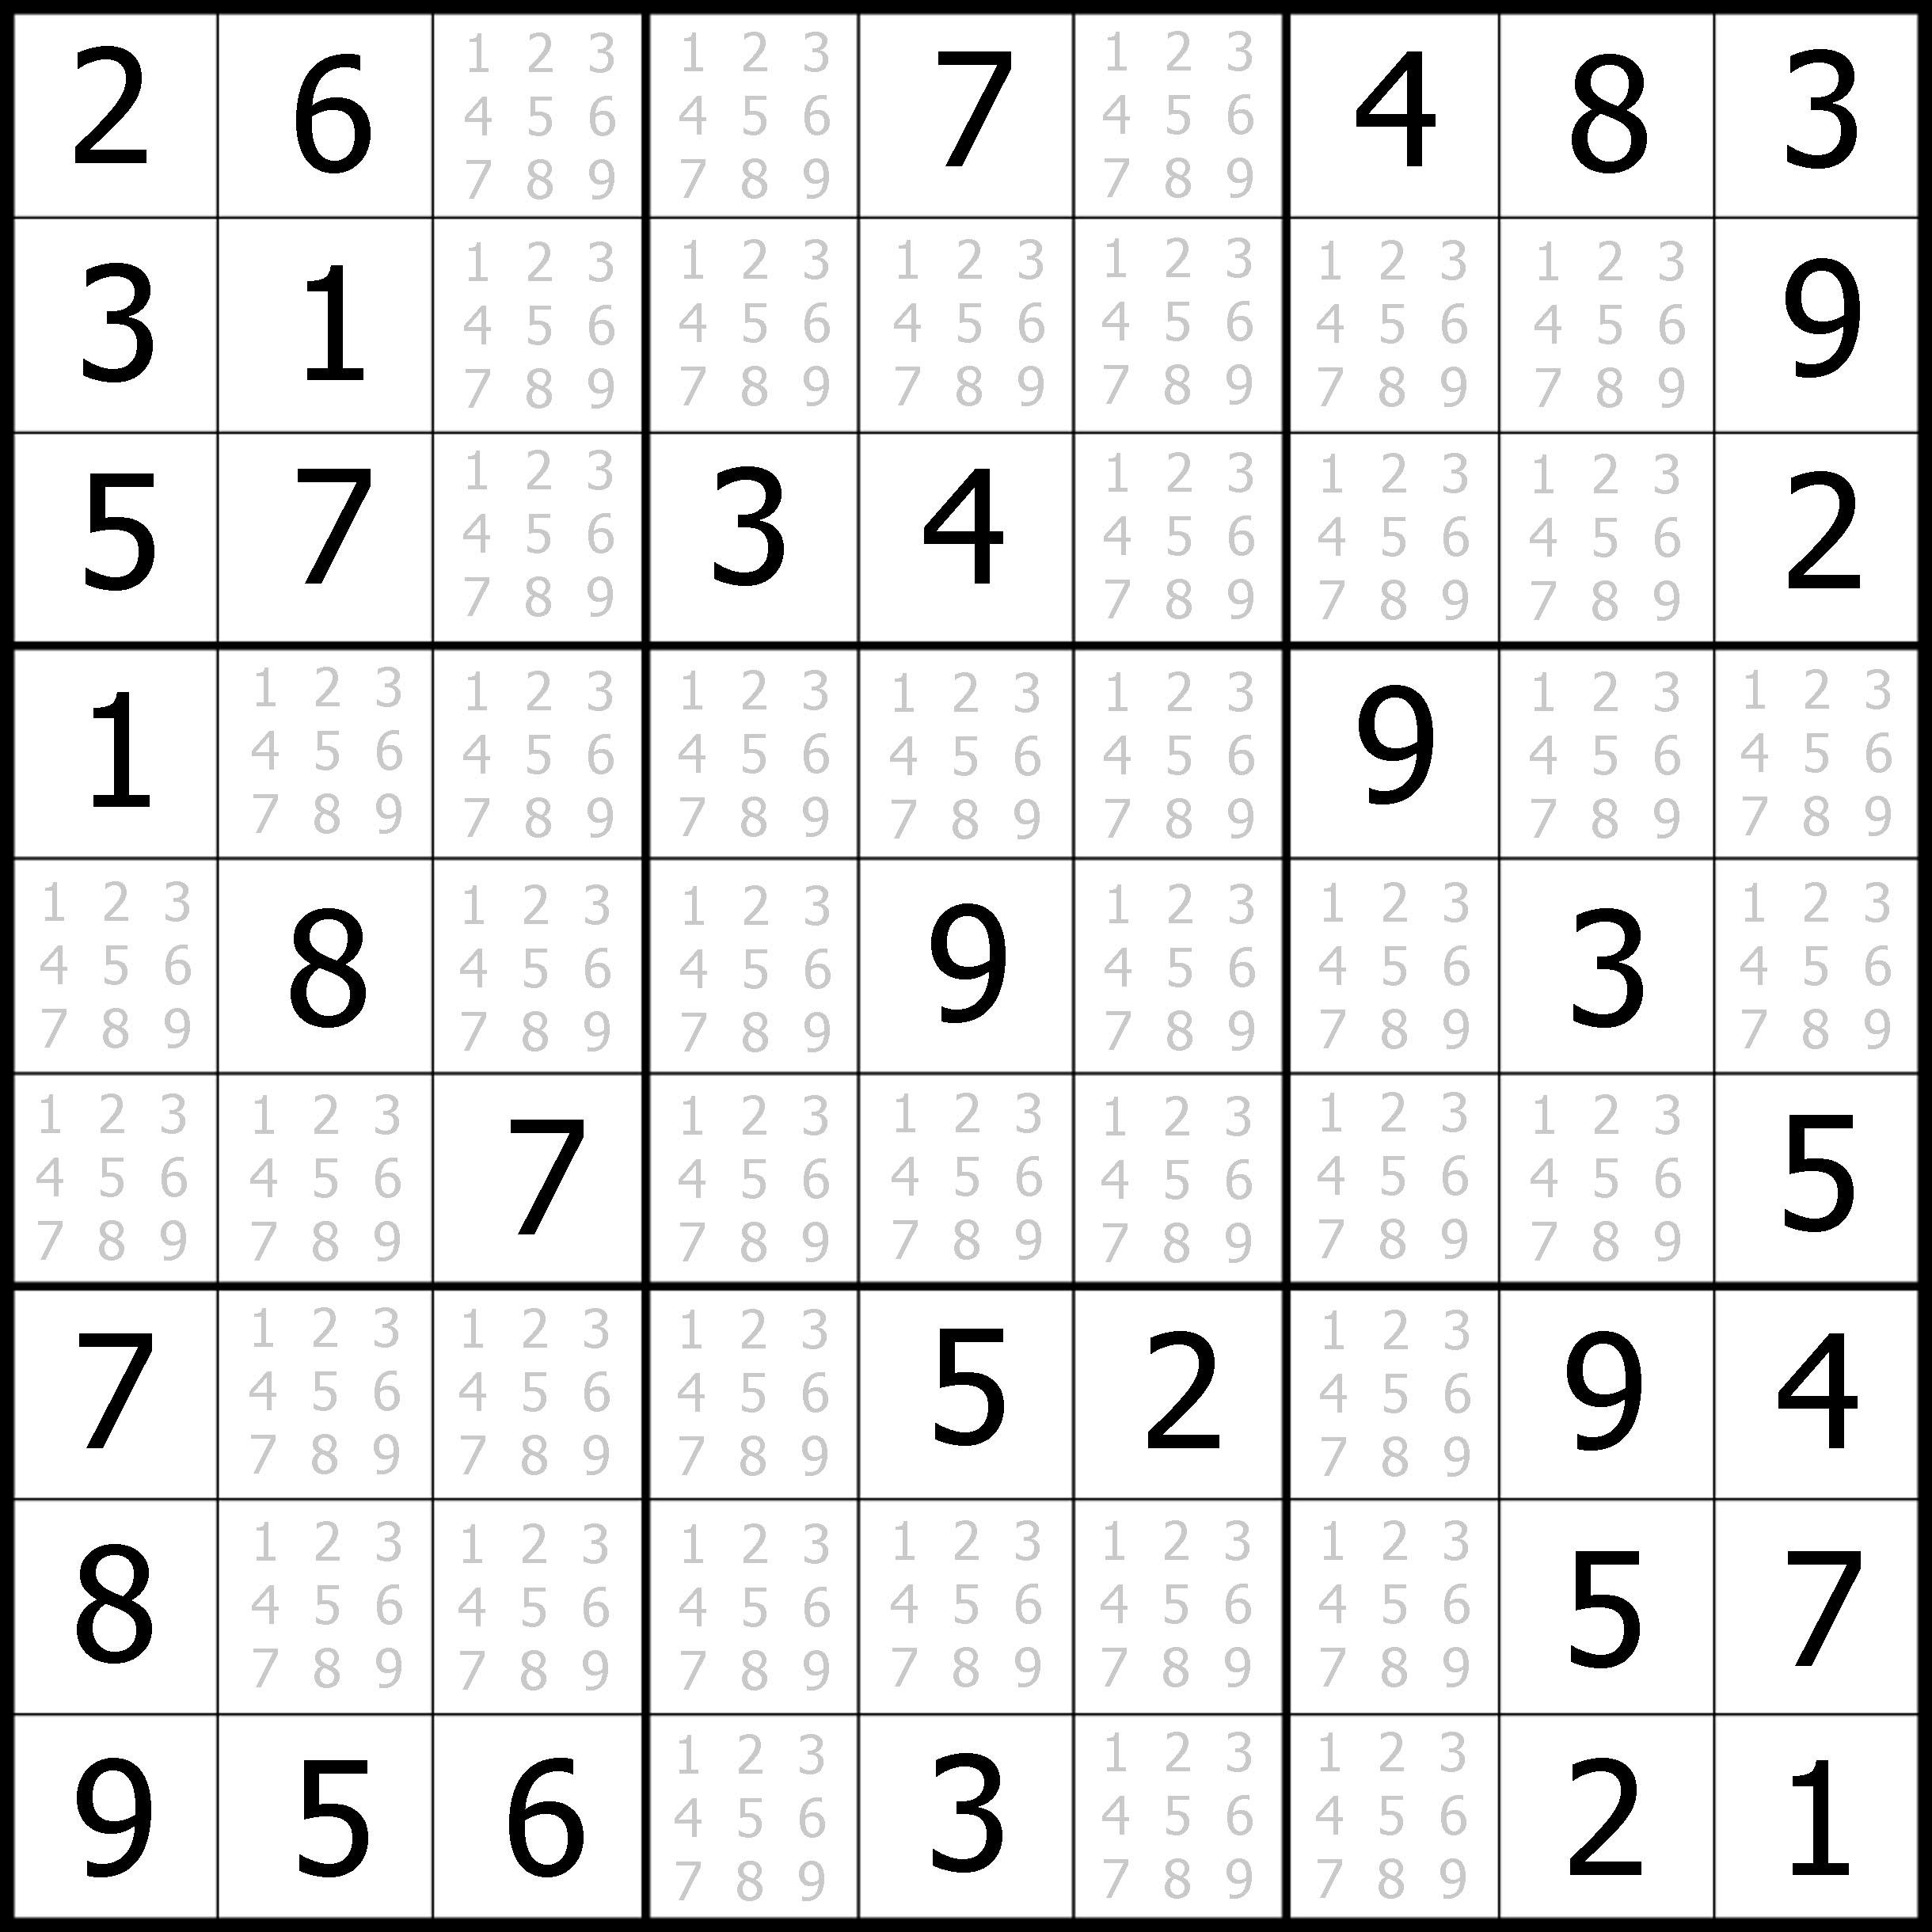 Easy Sudoku Printable | Kids Activities - Printable Sudoku Puzzles 8 Per Page